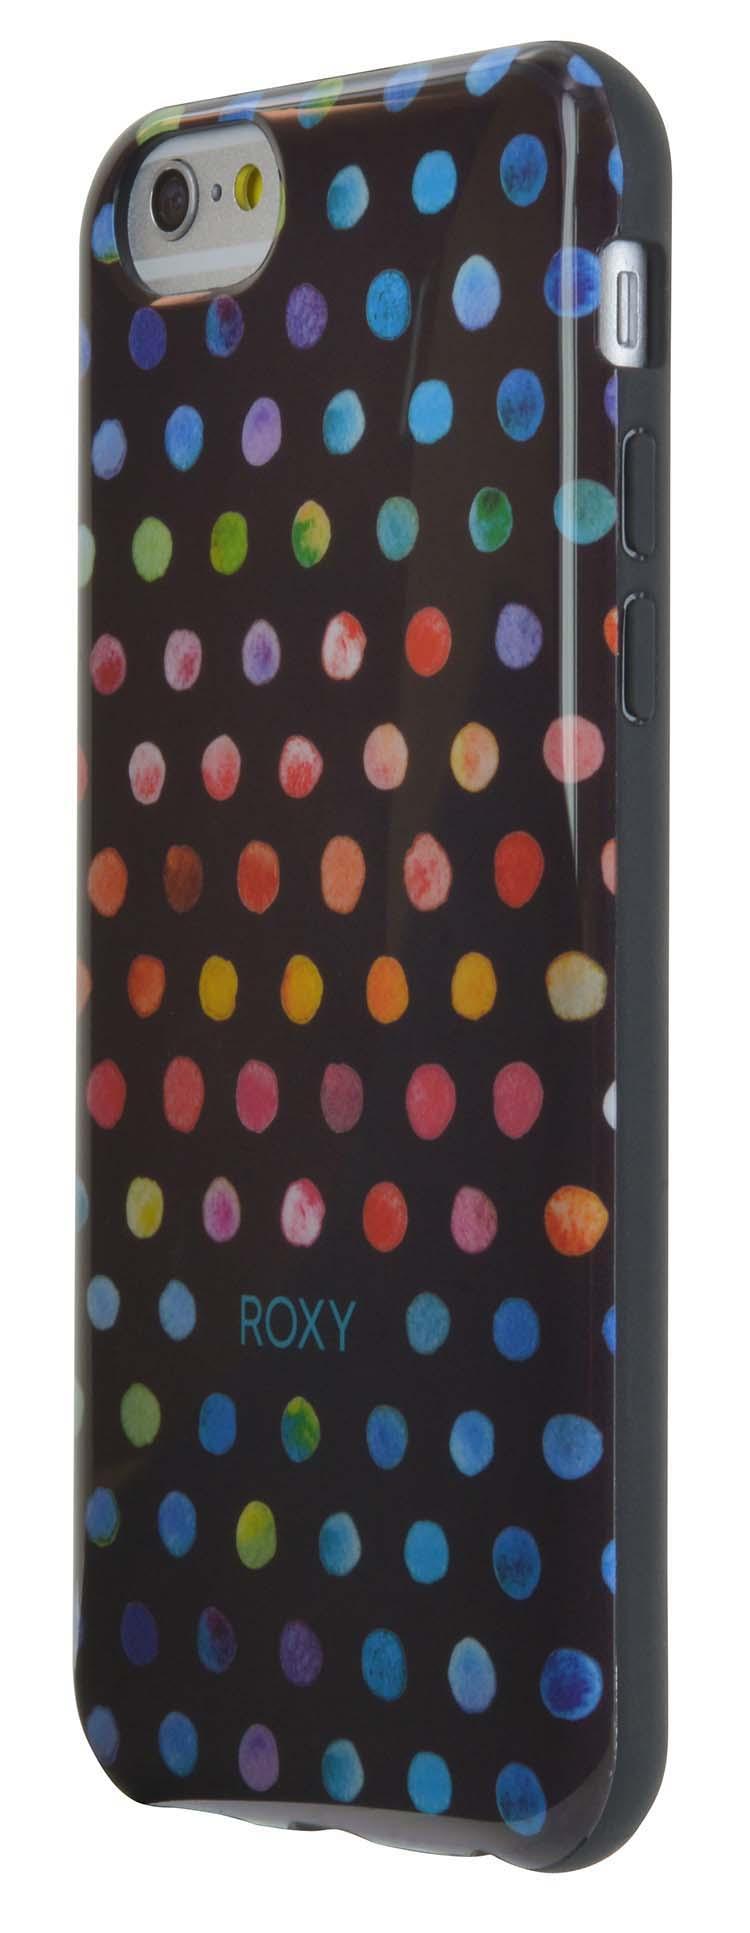 ROXY Hard Case Gypsy Dots - Image